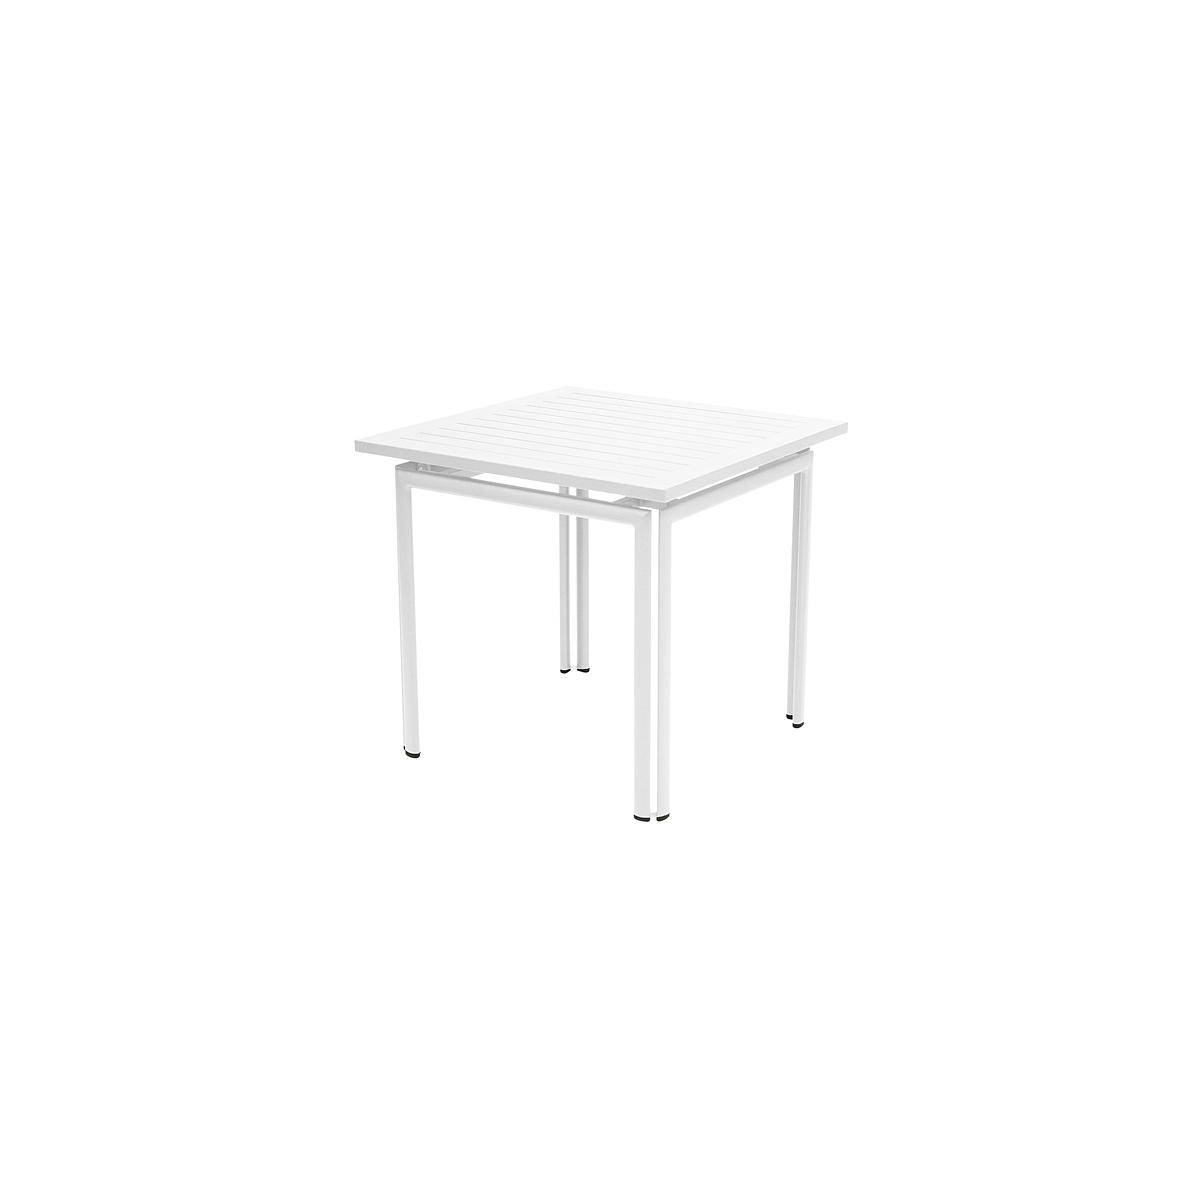 COSTA by Fermob Table 80x80 cm blanc coton